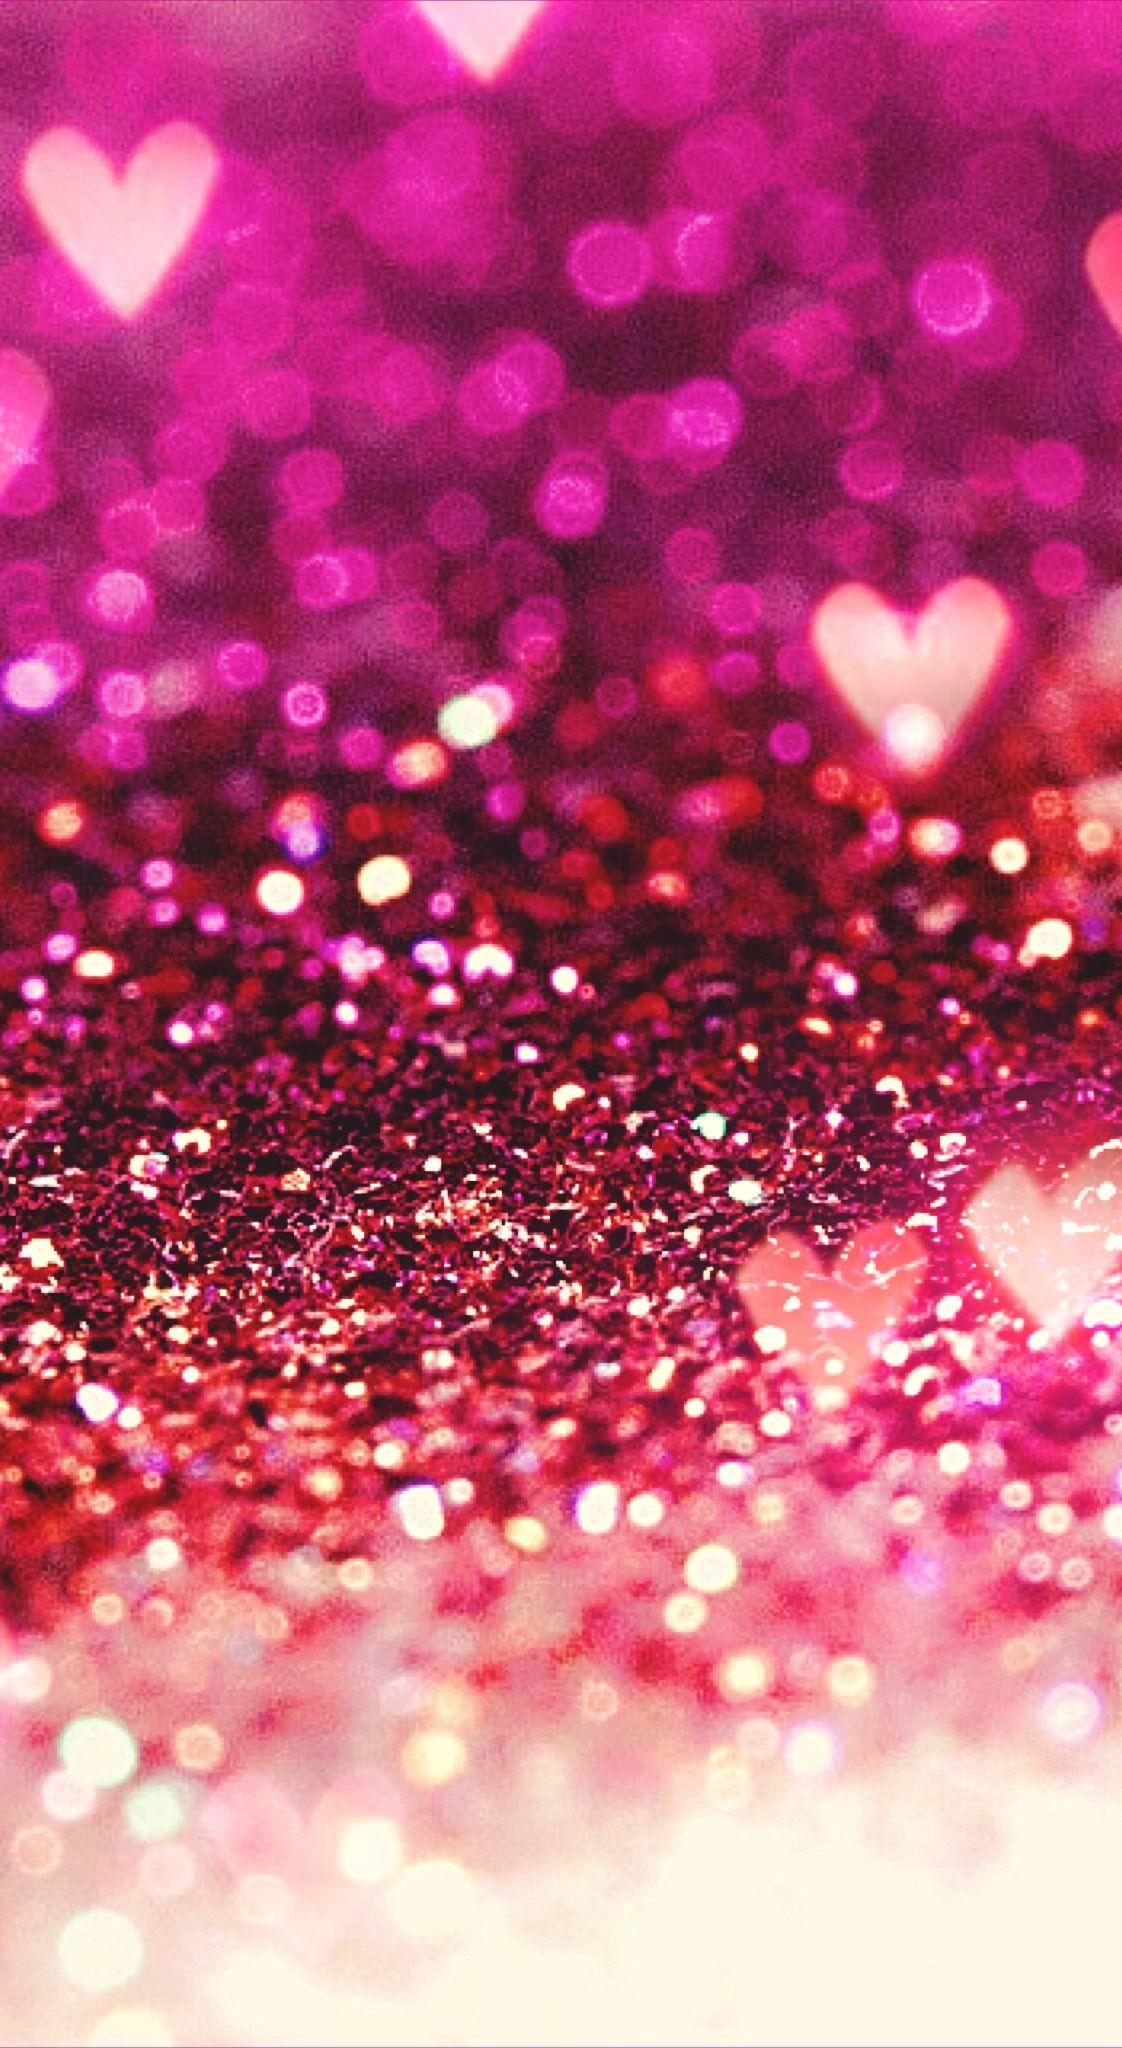 Pink Glitter Phone Wallpaper 76 Images